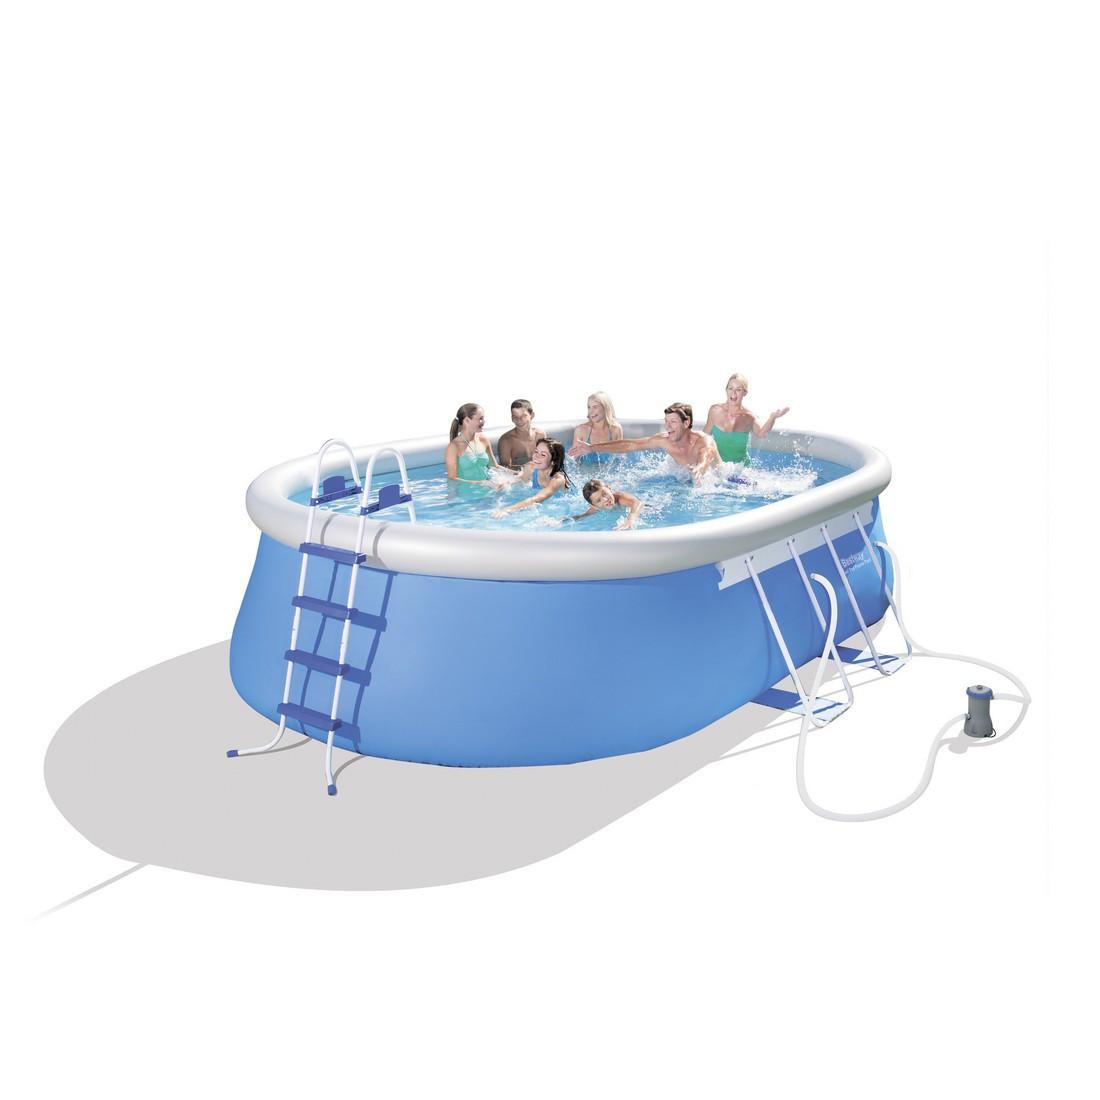 Каркасный бассейн Bestway 56461 (56153)